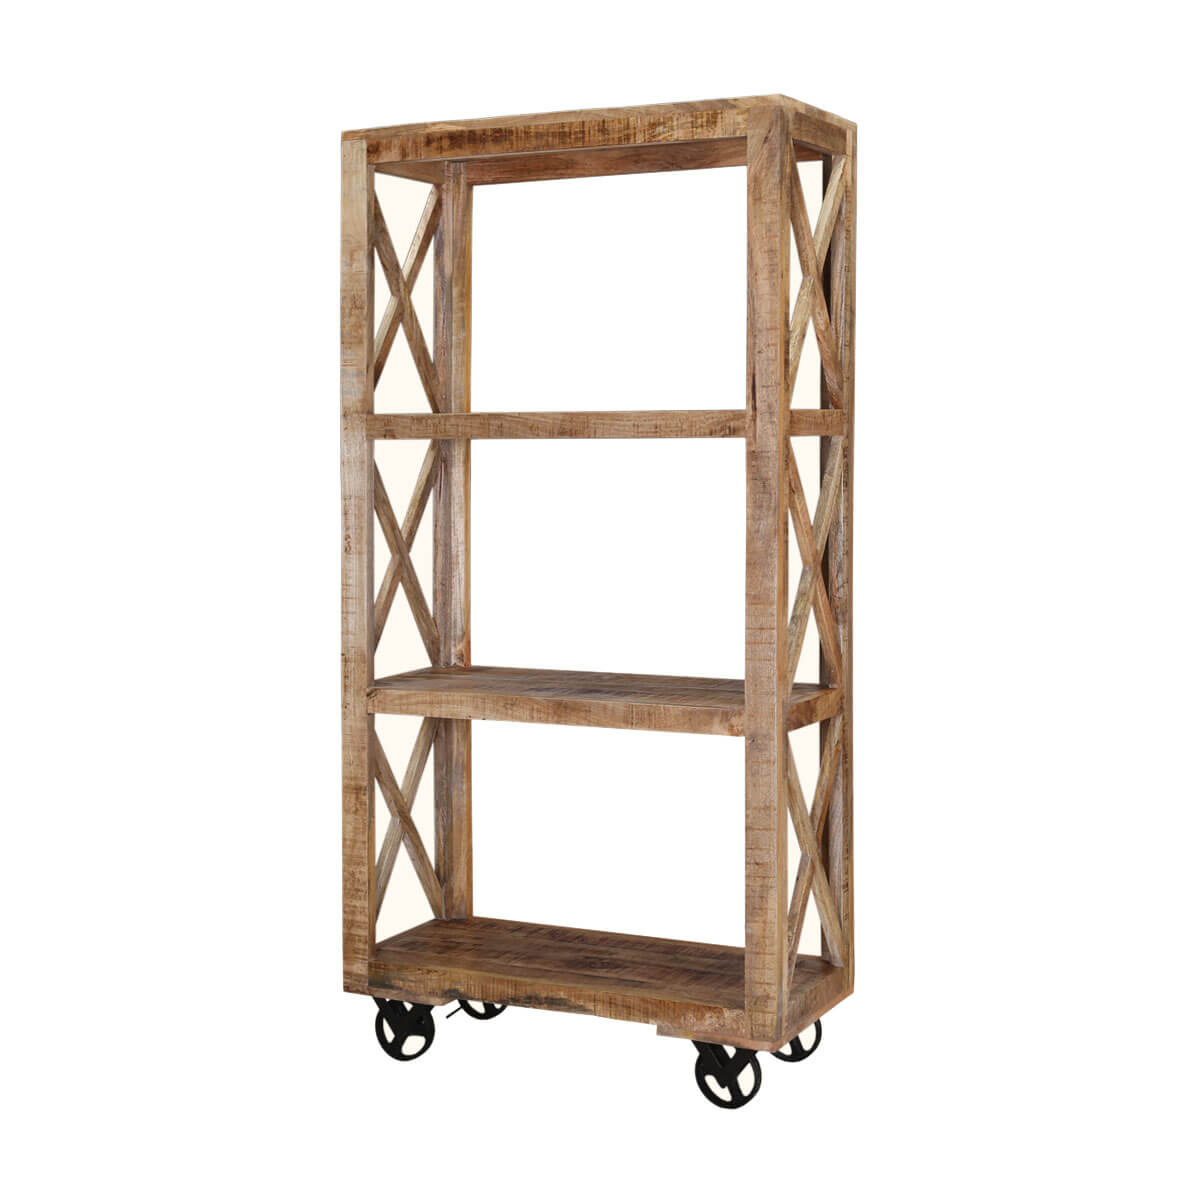 Astoria 3 Open Shelf Industrial Solid Wood Rolling Bookcase